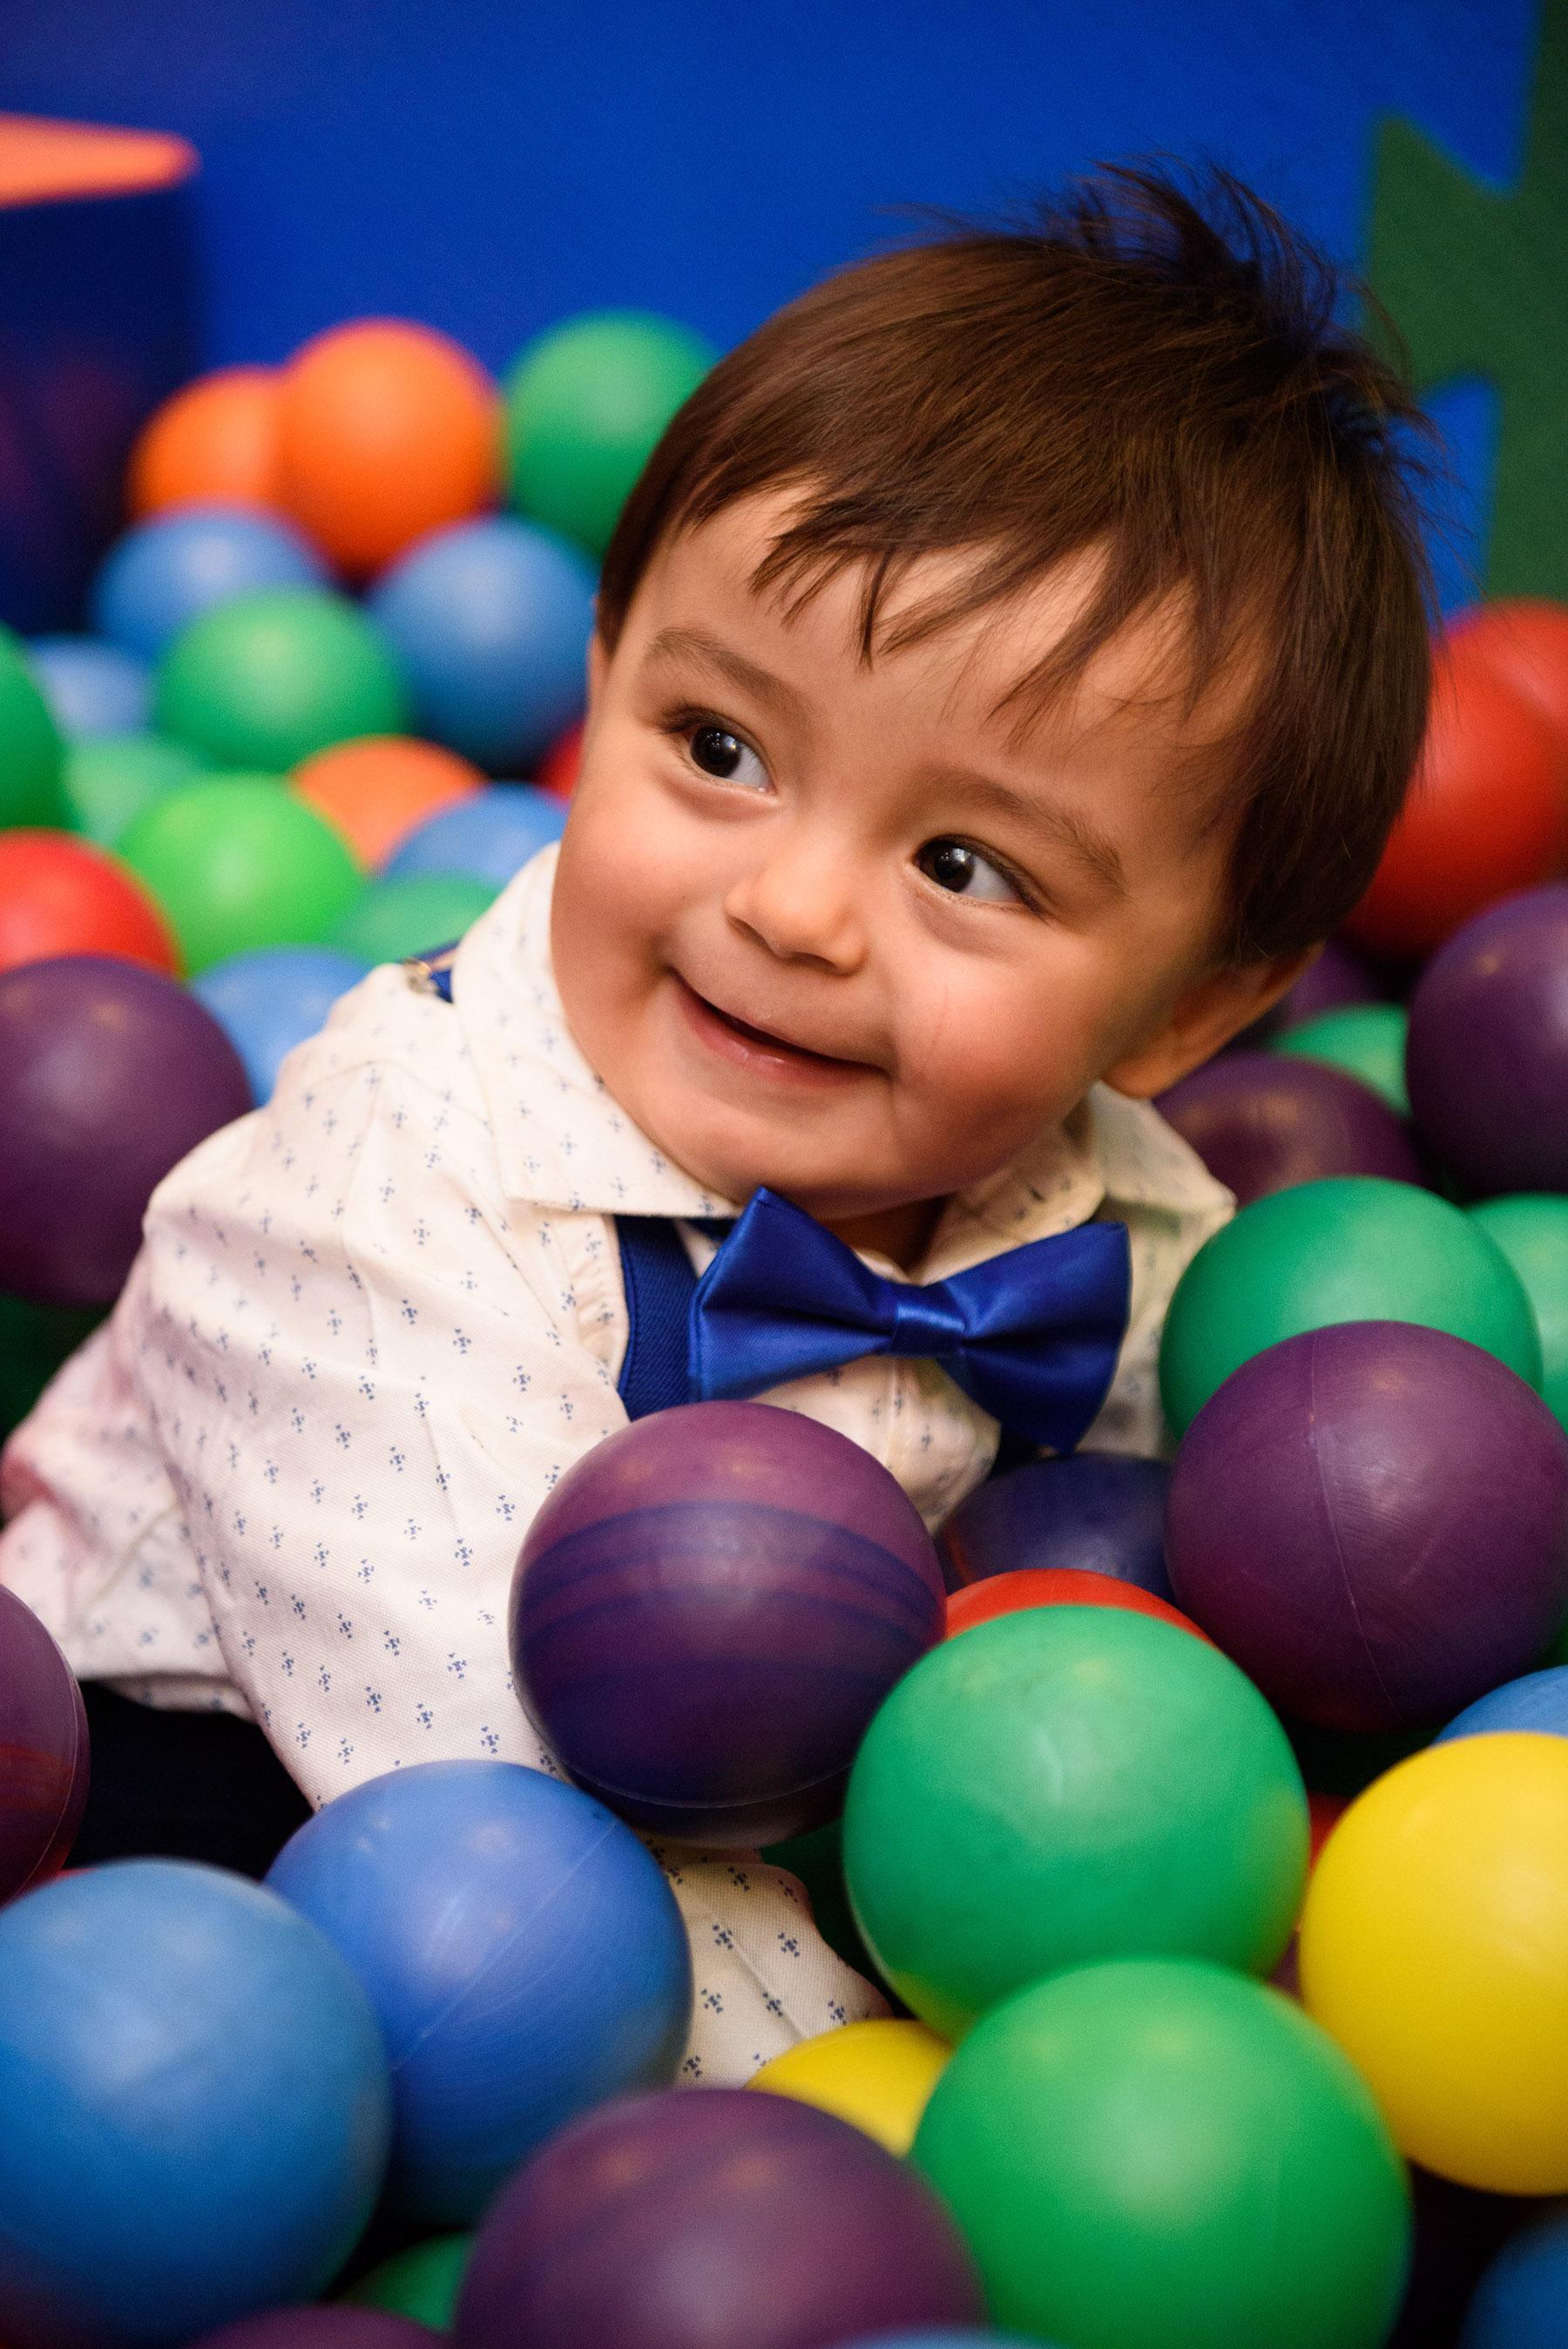 09-festa-infantil-curitiba-mundokids-festade1ano-tema-circo-guswanderley.jpg